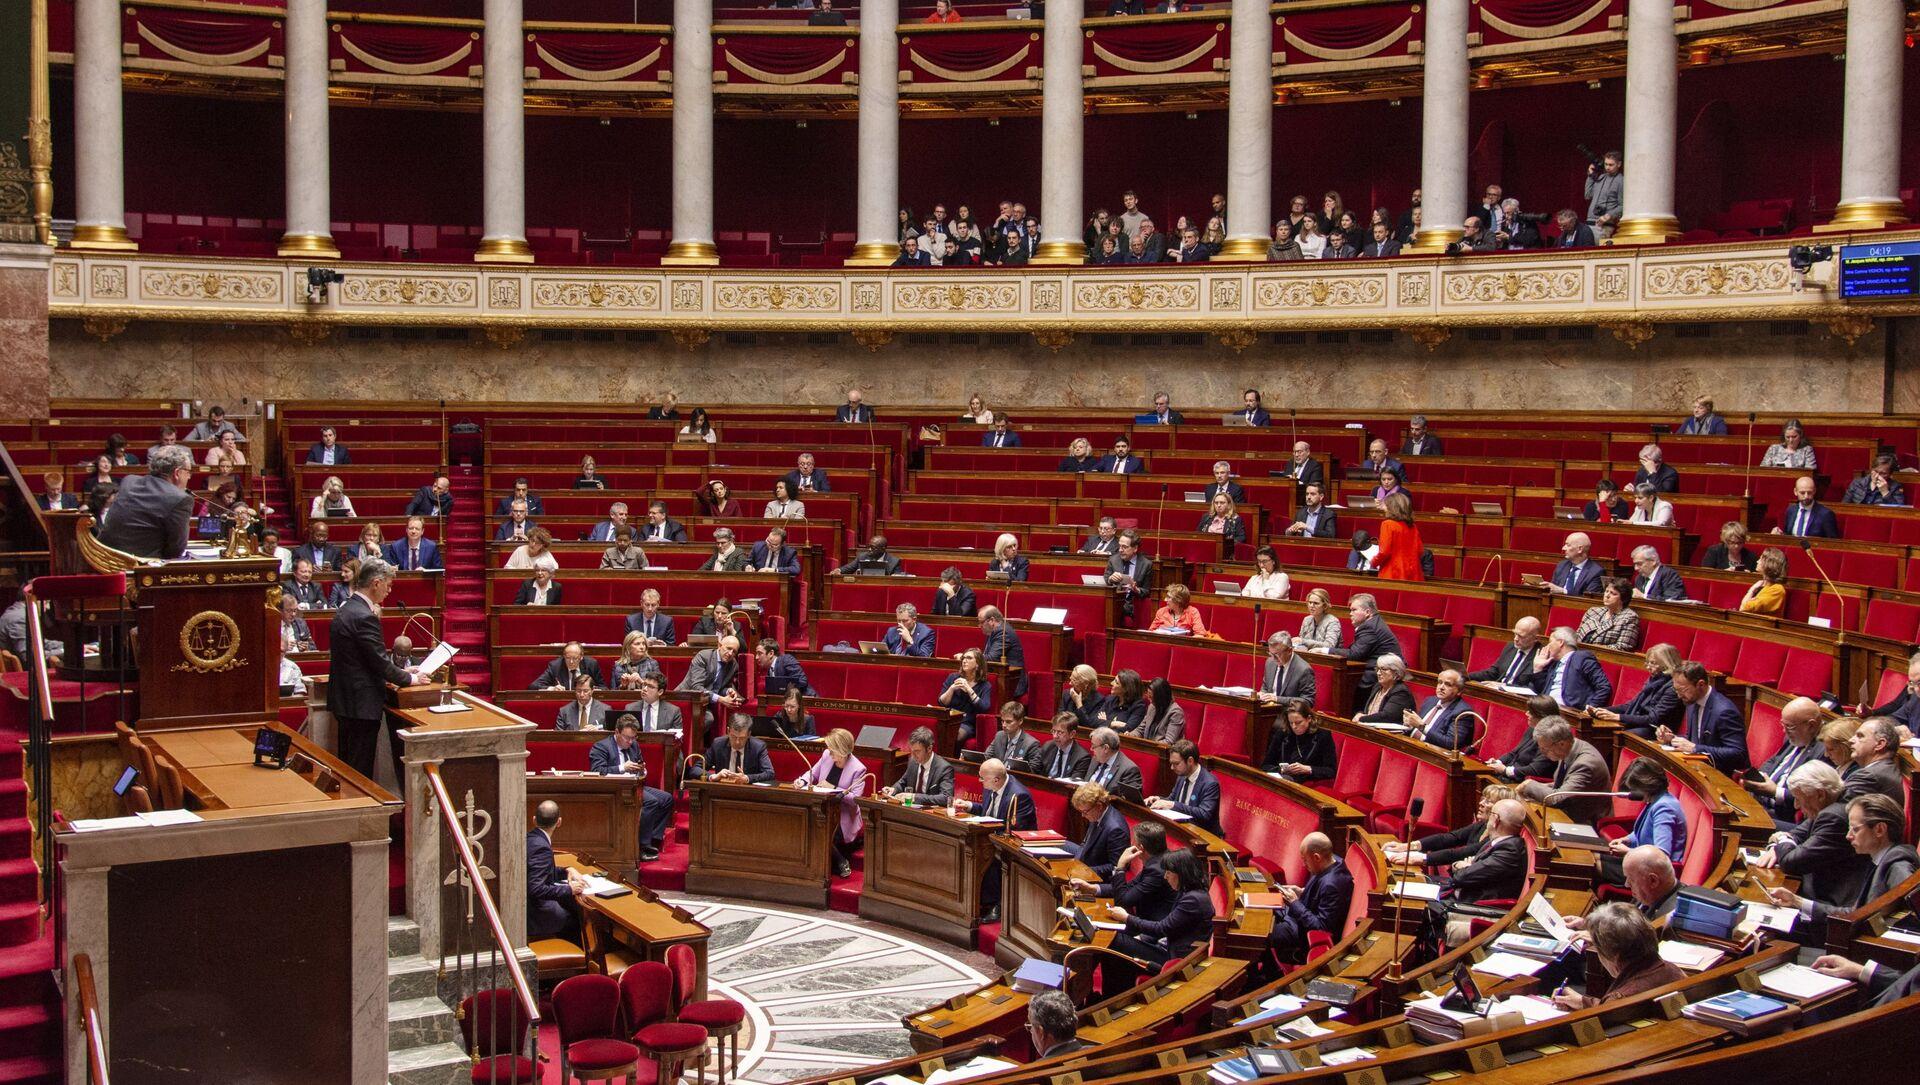 Assemblée nationale - Sputnik France, 1920, 02.08.2021